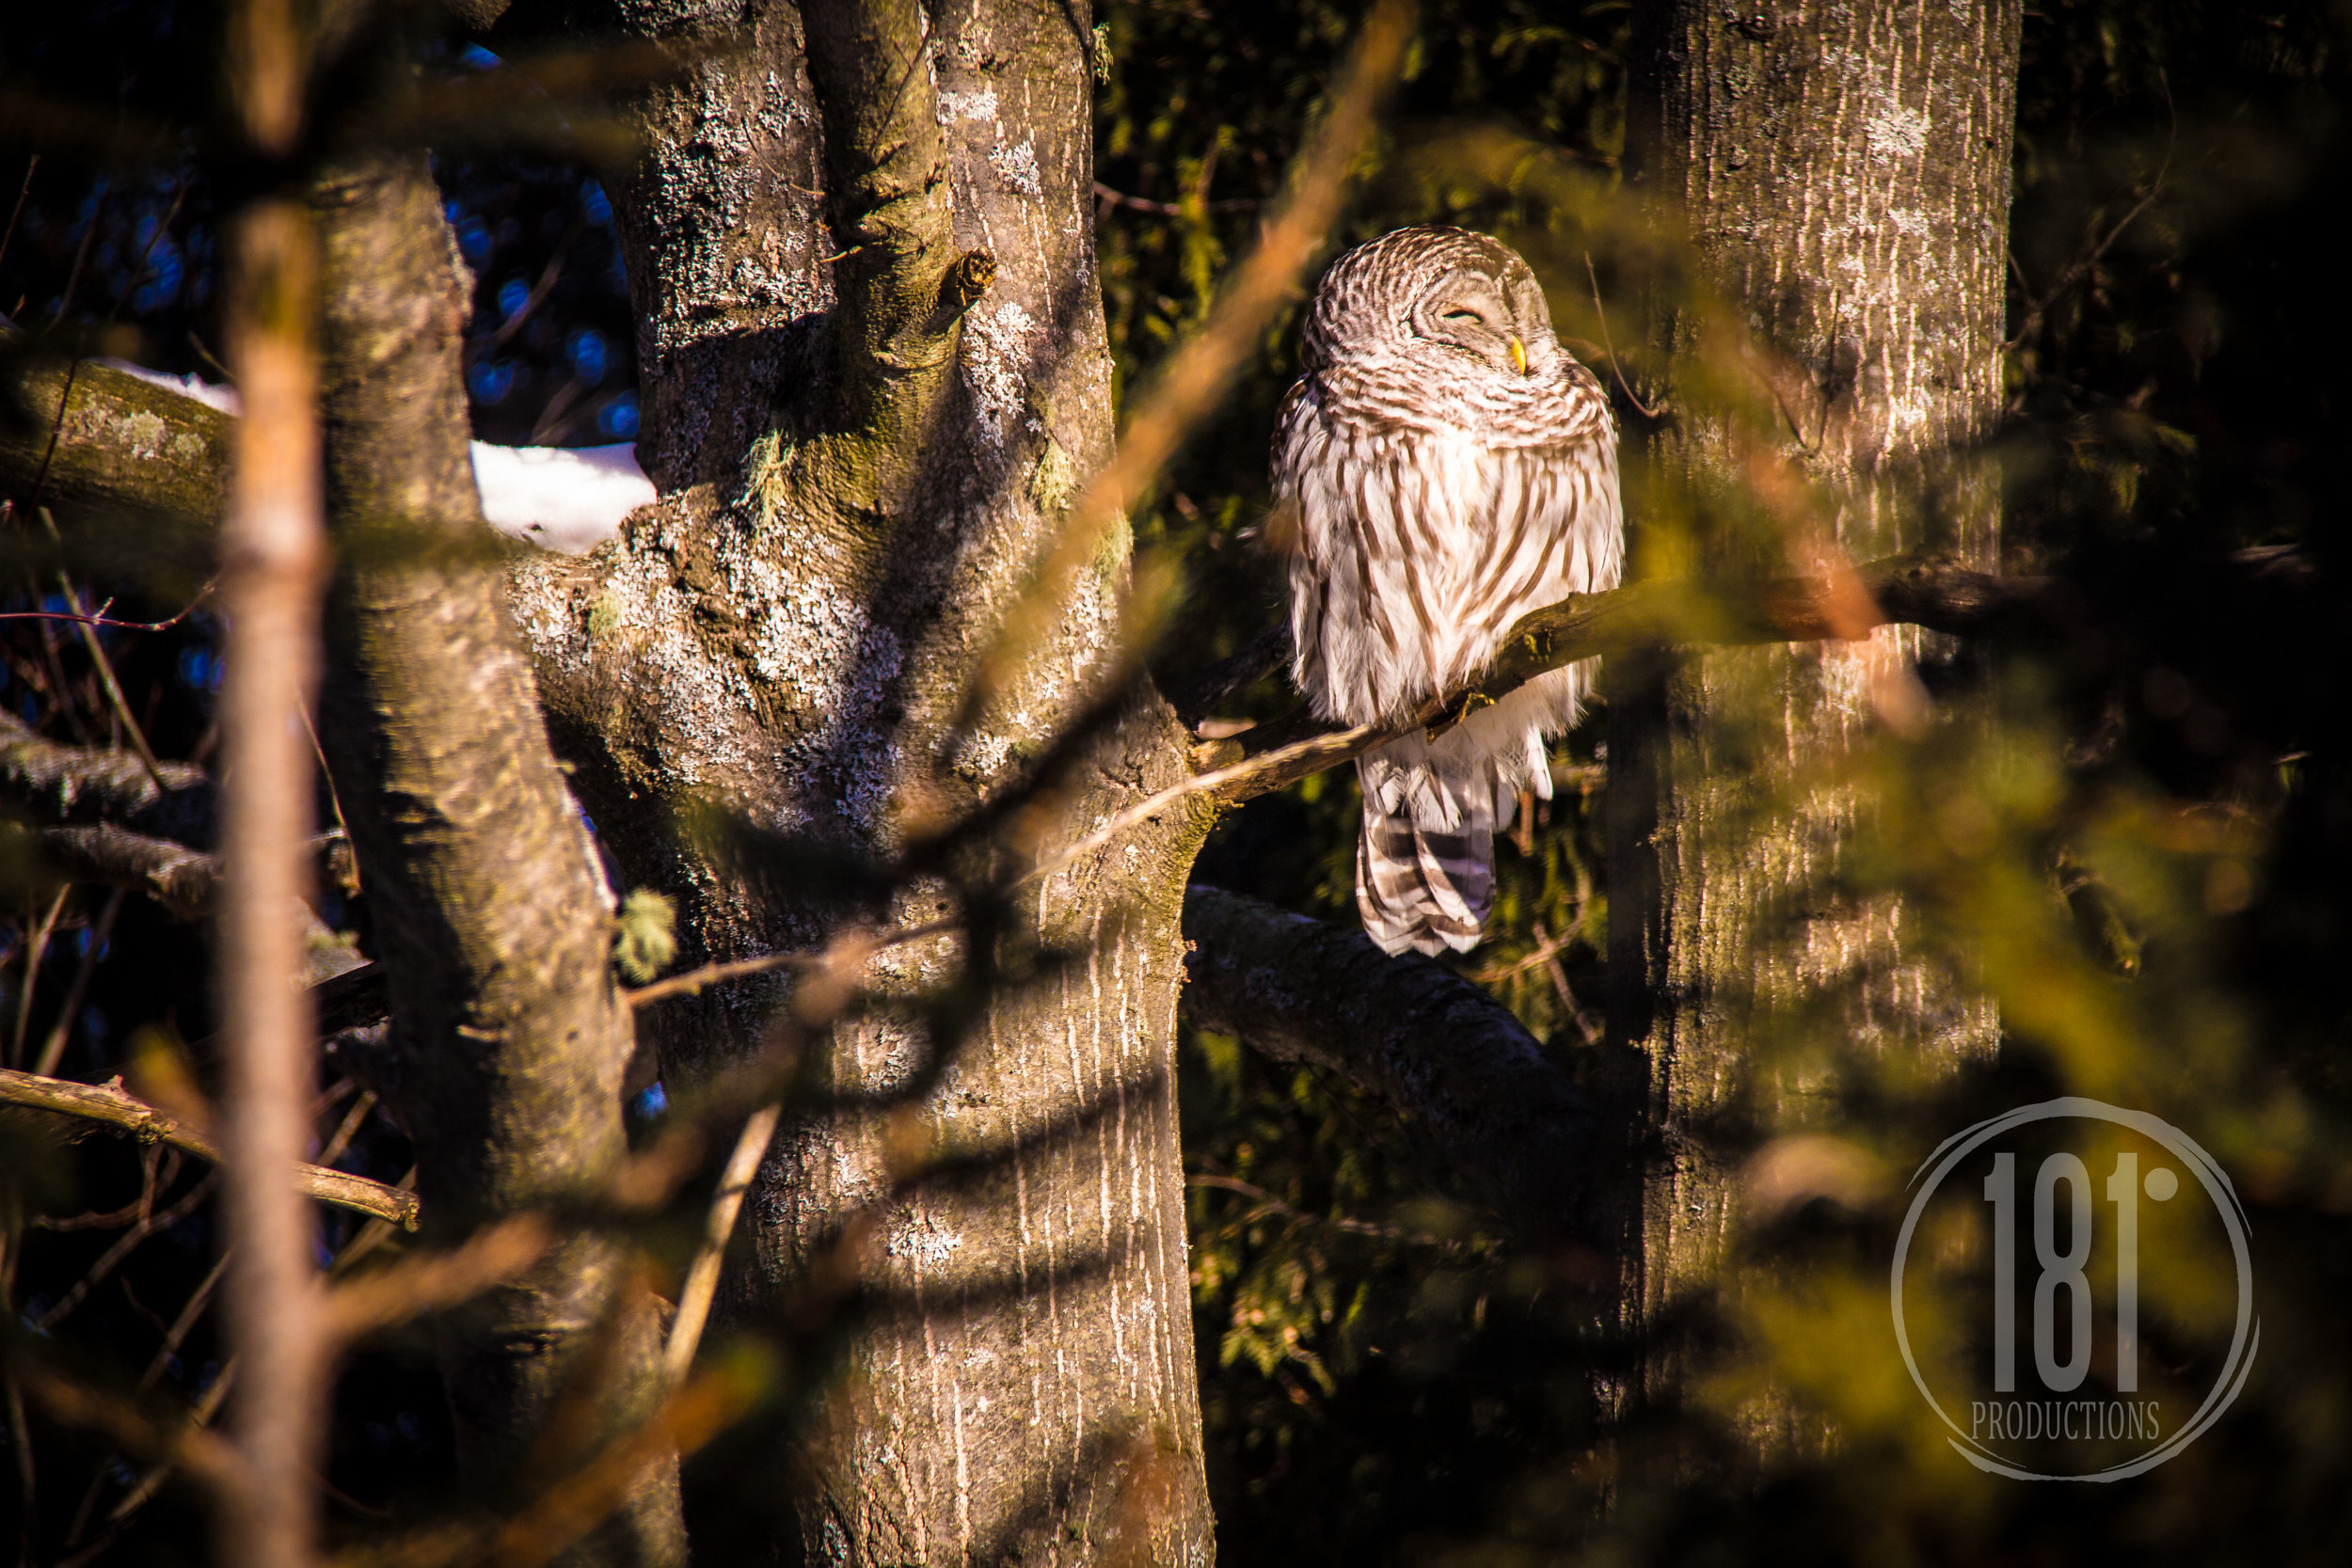 OwlintheBackyard-Jan3.2013-3